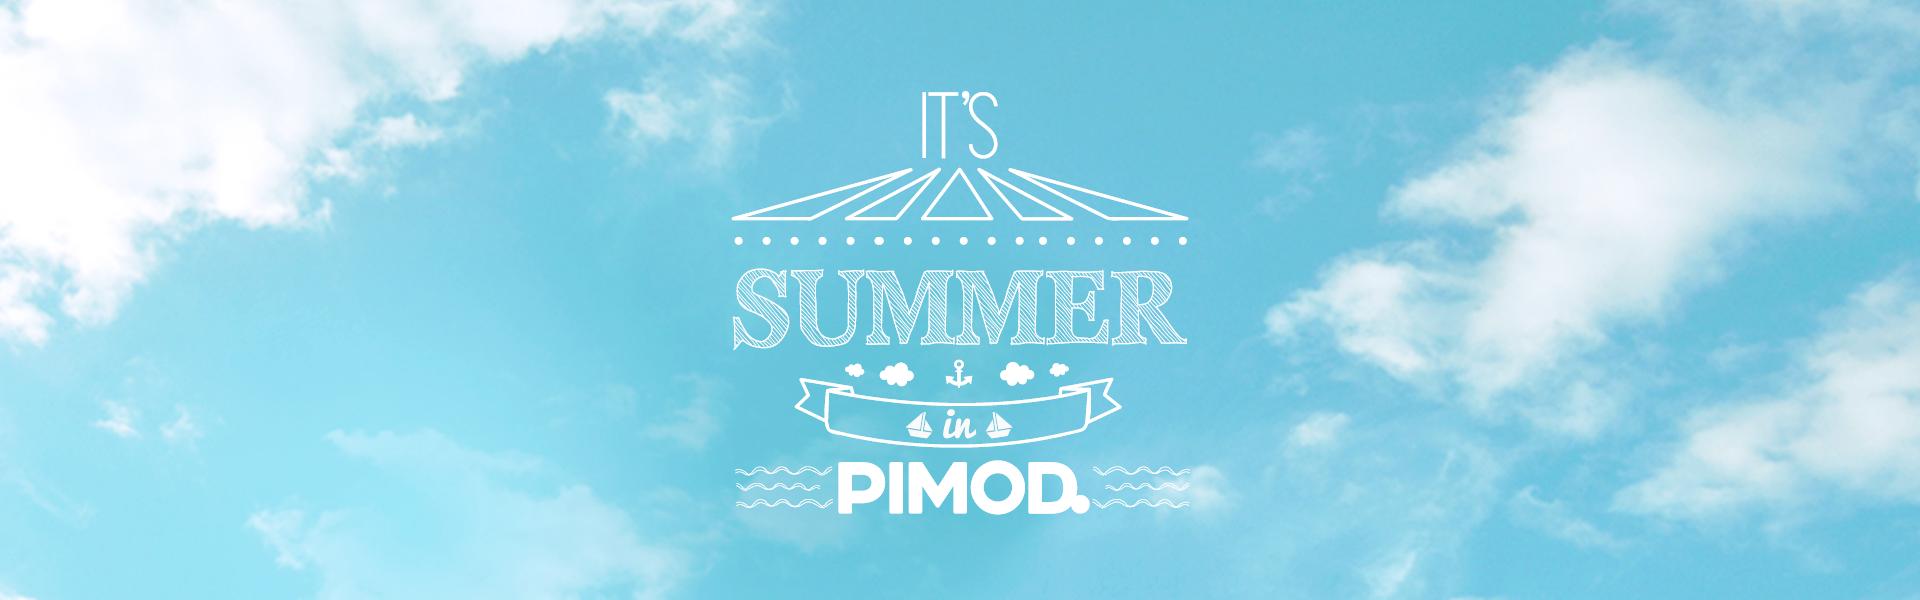 slide_summer_pimod